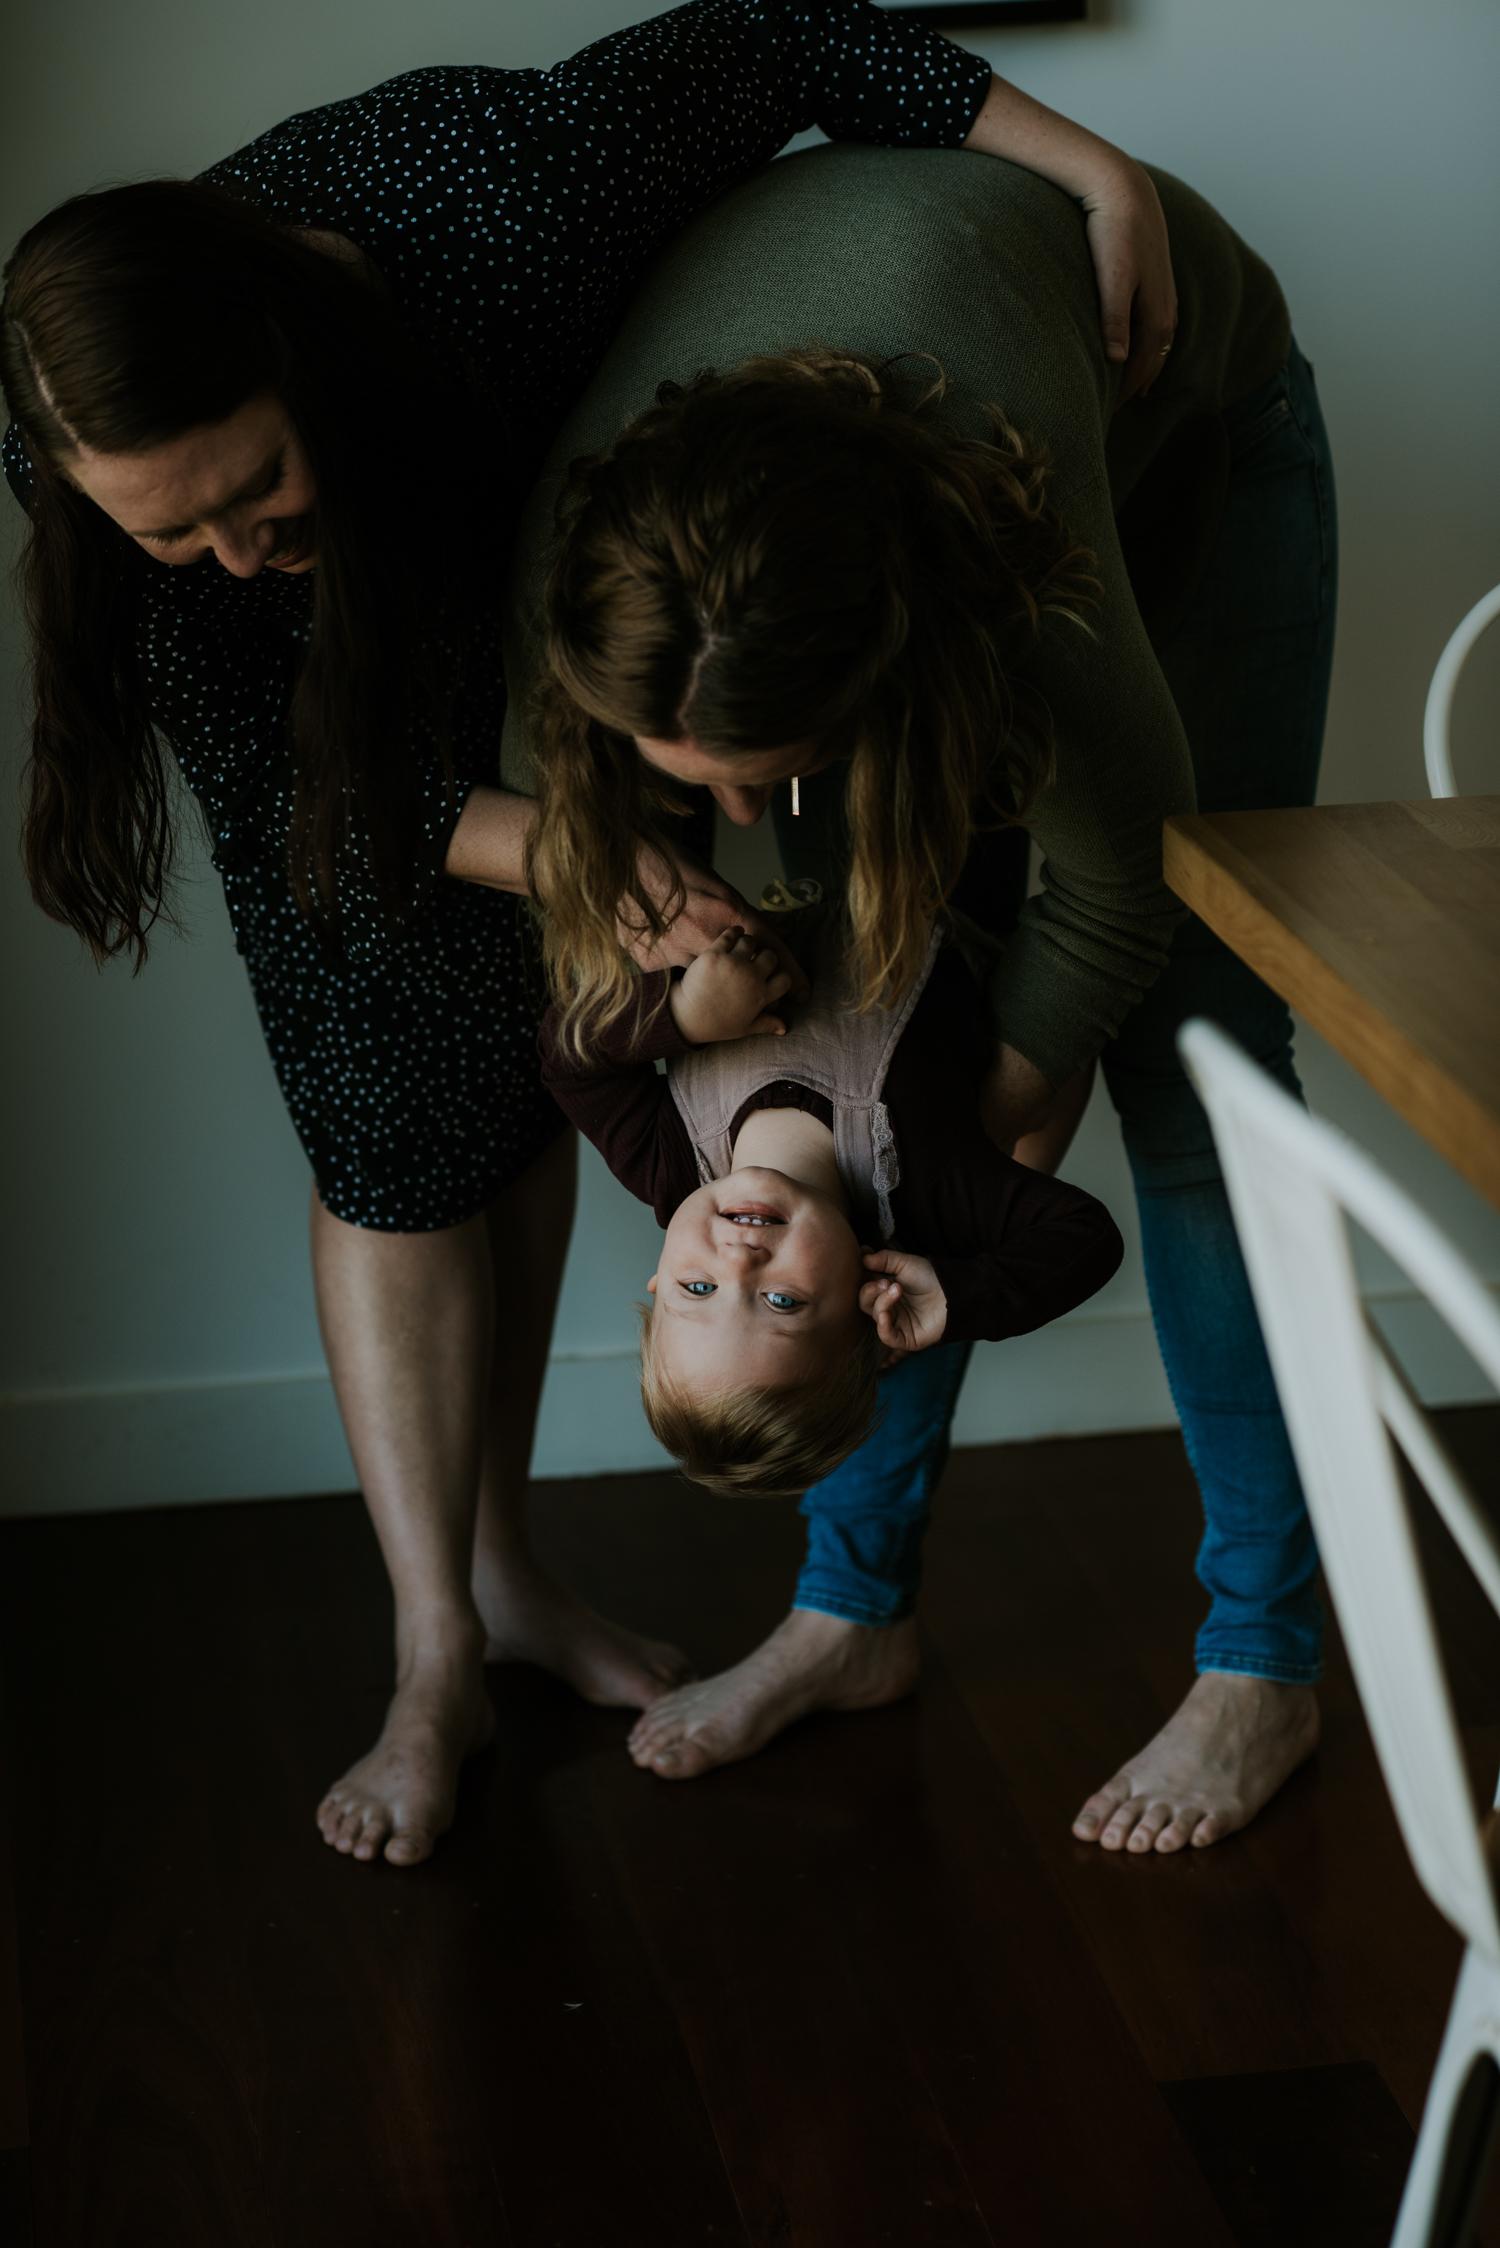 Brisbane Family Photographer | Newborn-Lifestyle Photography-39.jpg